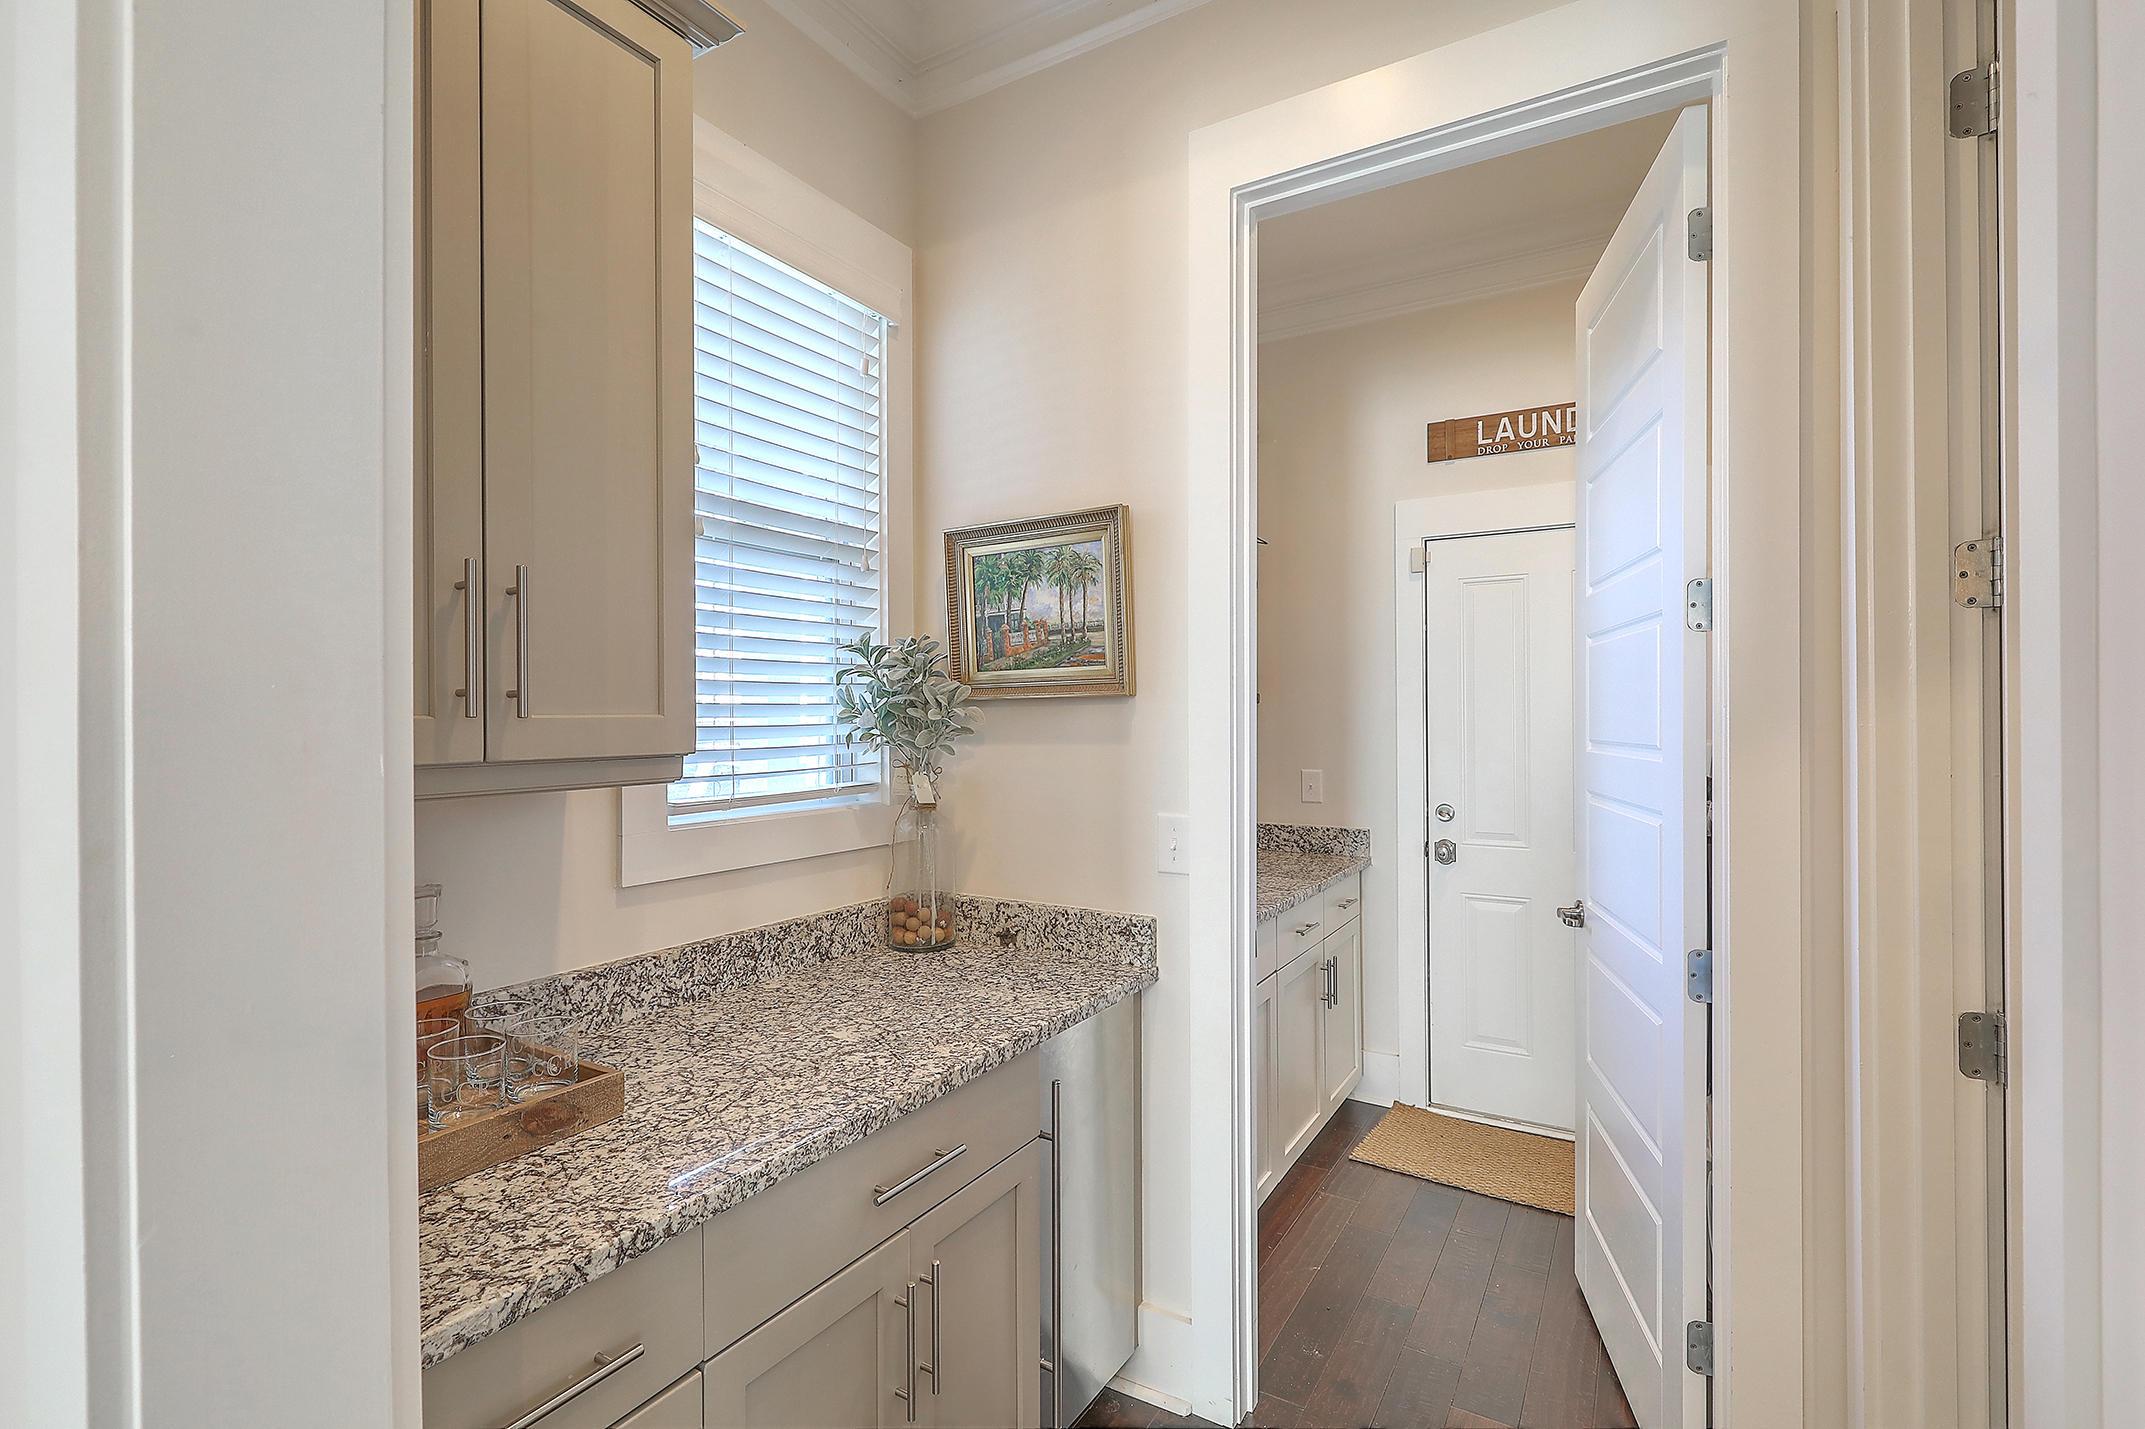 Stiles Point Plantation Homes For Sale - 750 Old Plantation, Charleston, SC - 4